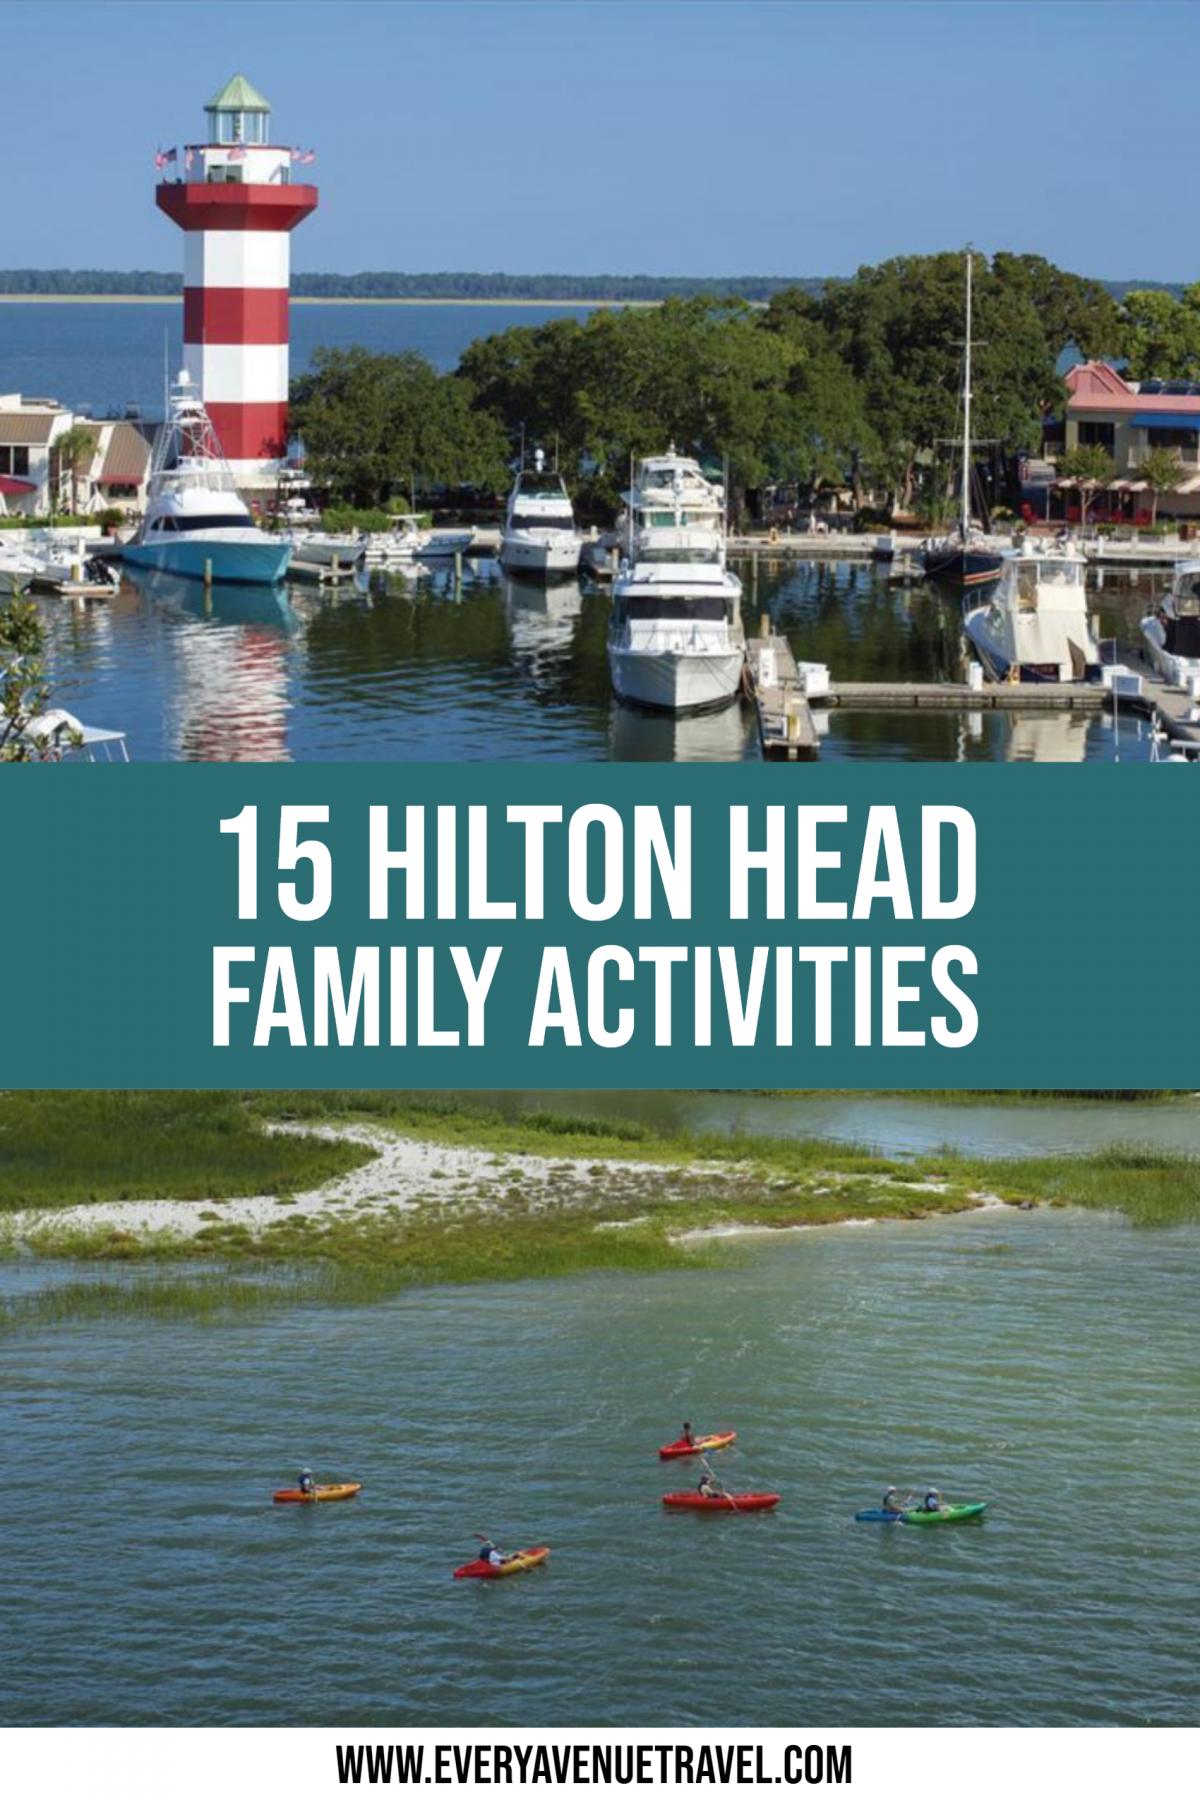 15 Hilton Head Family Activities